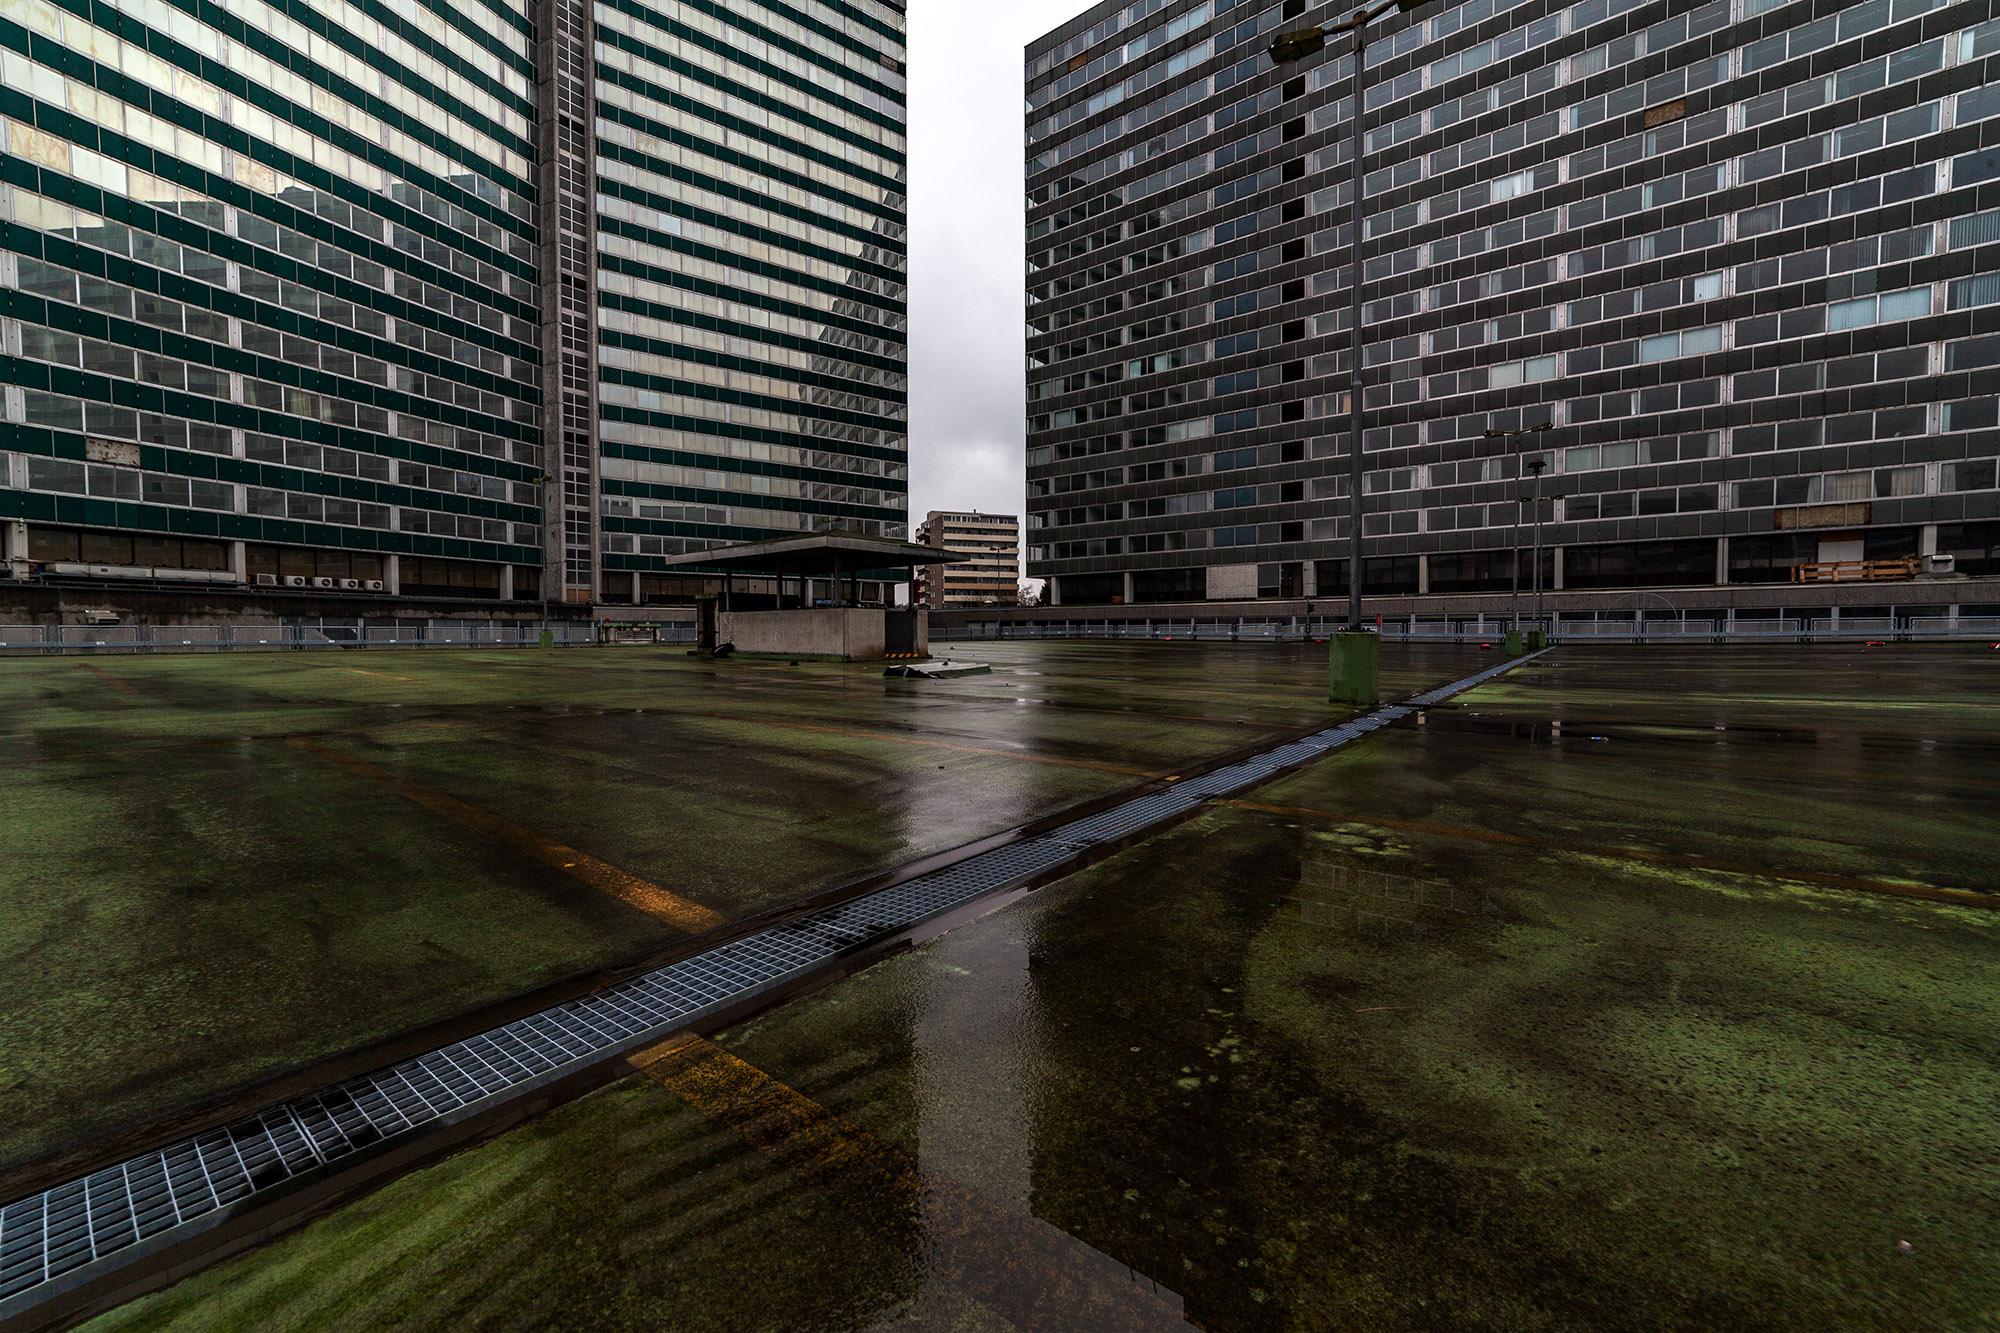 KWU Parkfläche , Vitopia Offenbach , Baustelle Offenbach , KWU-Areal , Leerstand , Ghost Tower , Siemens , Framatom , Lost Places , Urban Exploring , Energie , Kernkraftsparte